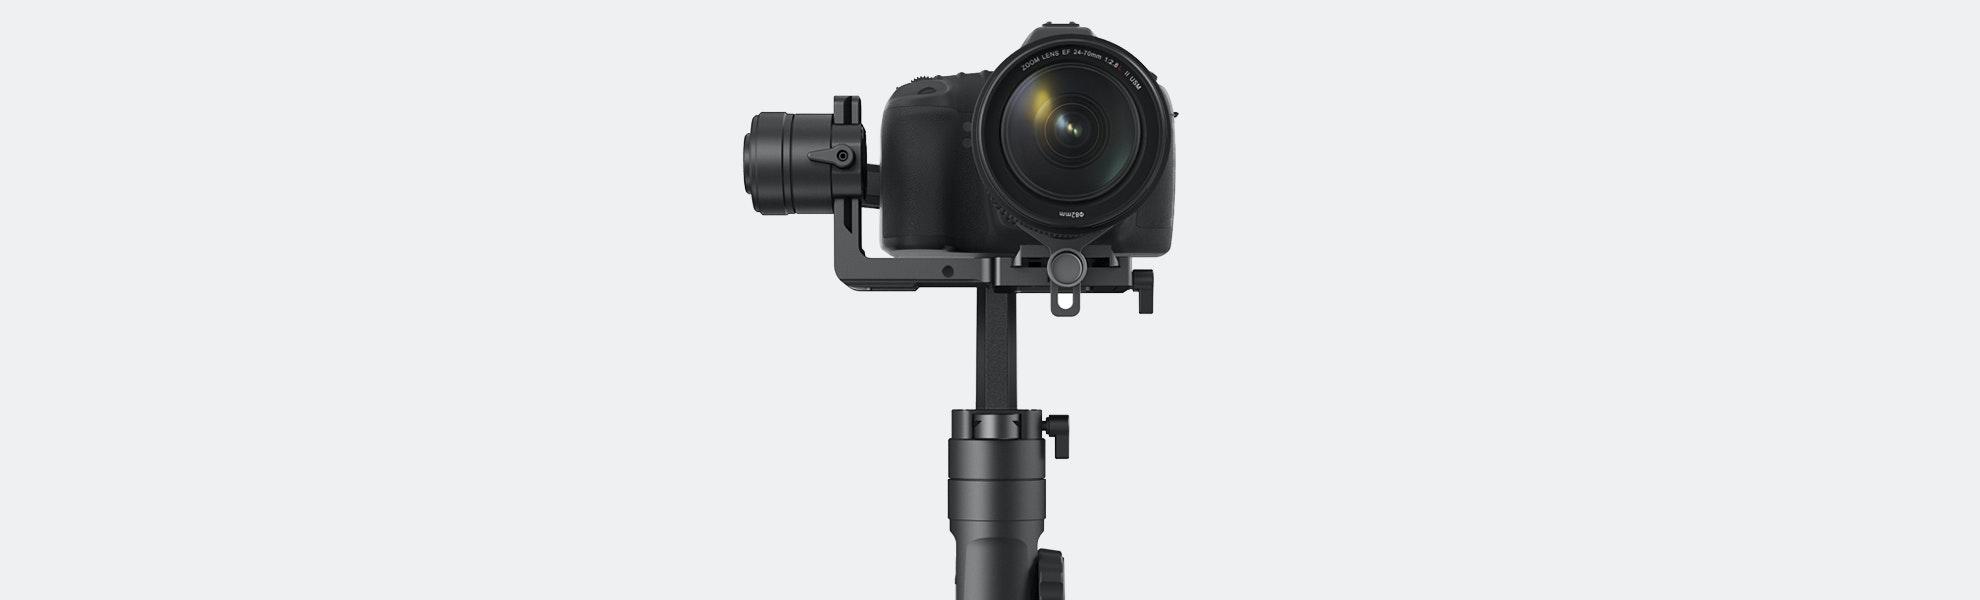 Zhiyun Crane-2 3-Axis Stabilizer